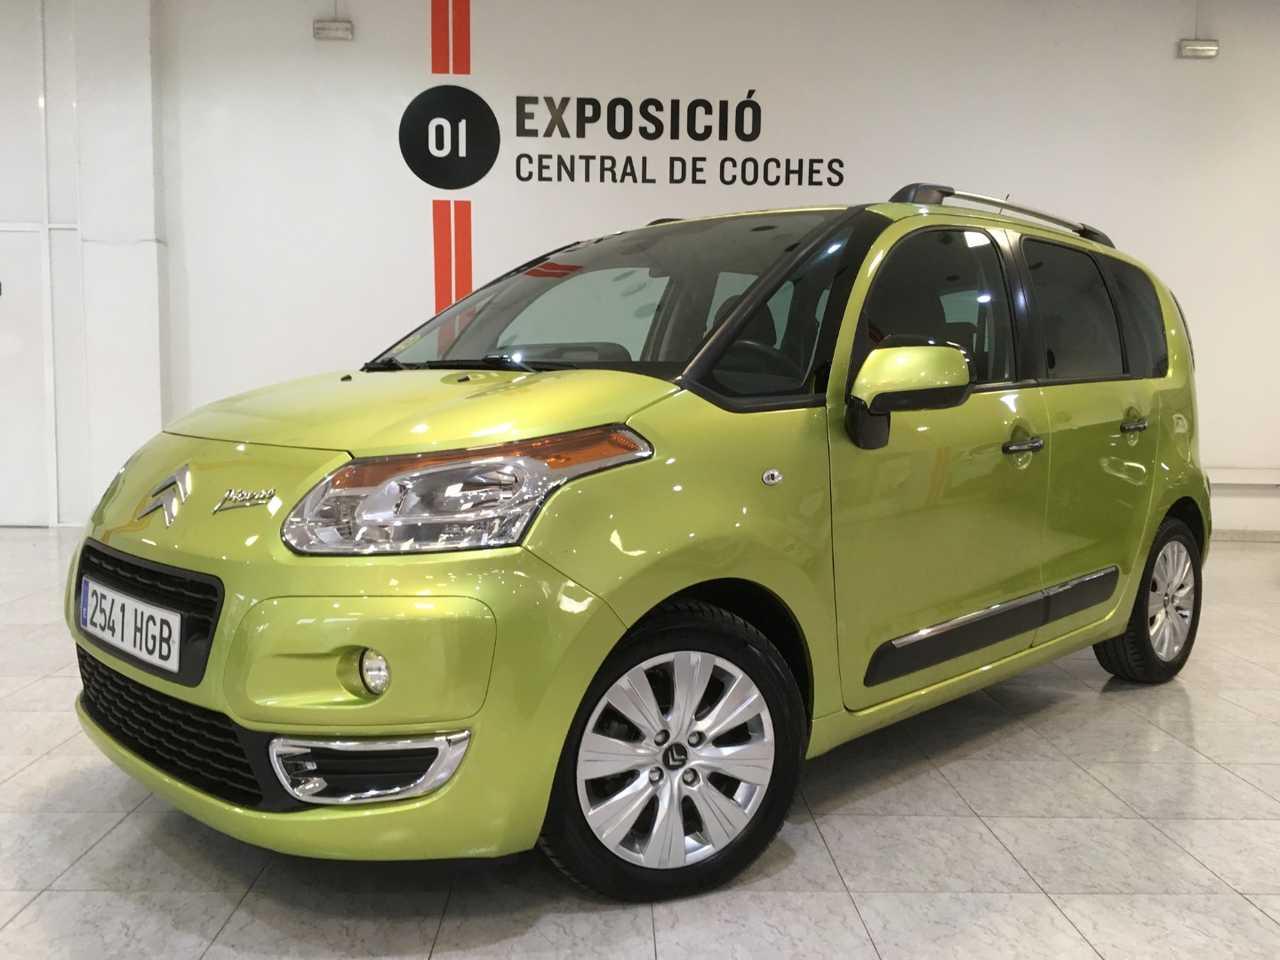 Citroën C3 Picasso 1.6 HDI 92cv Exclusive / Parktronic / Cruise / Bluetooth   - Foto 1